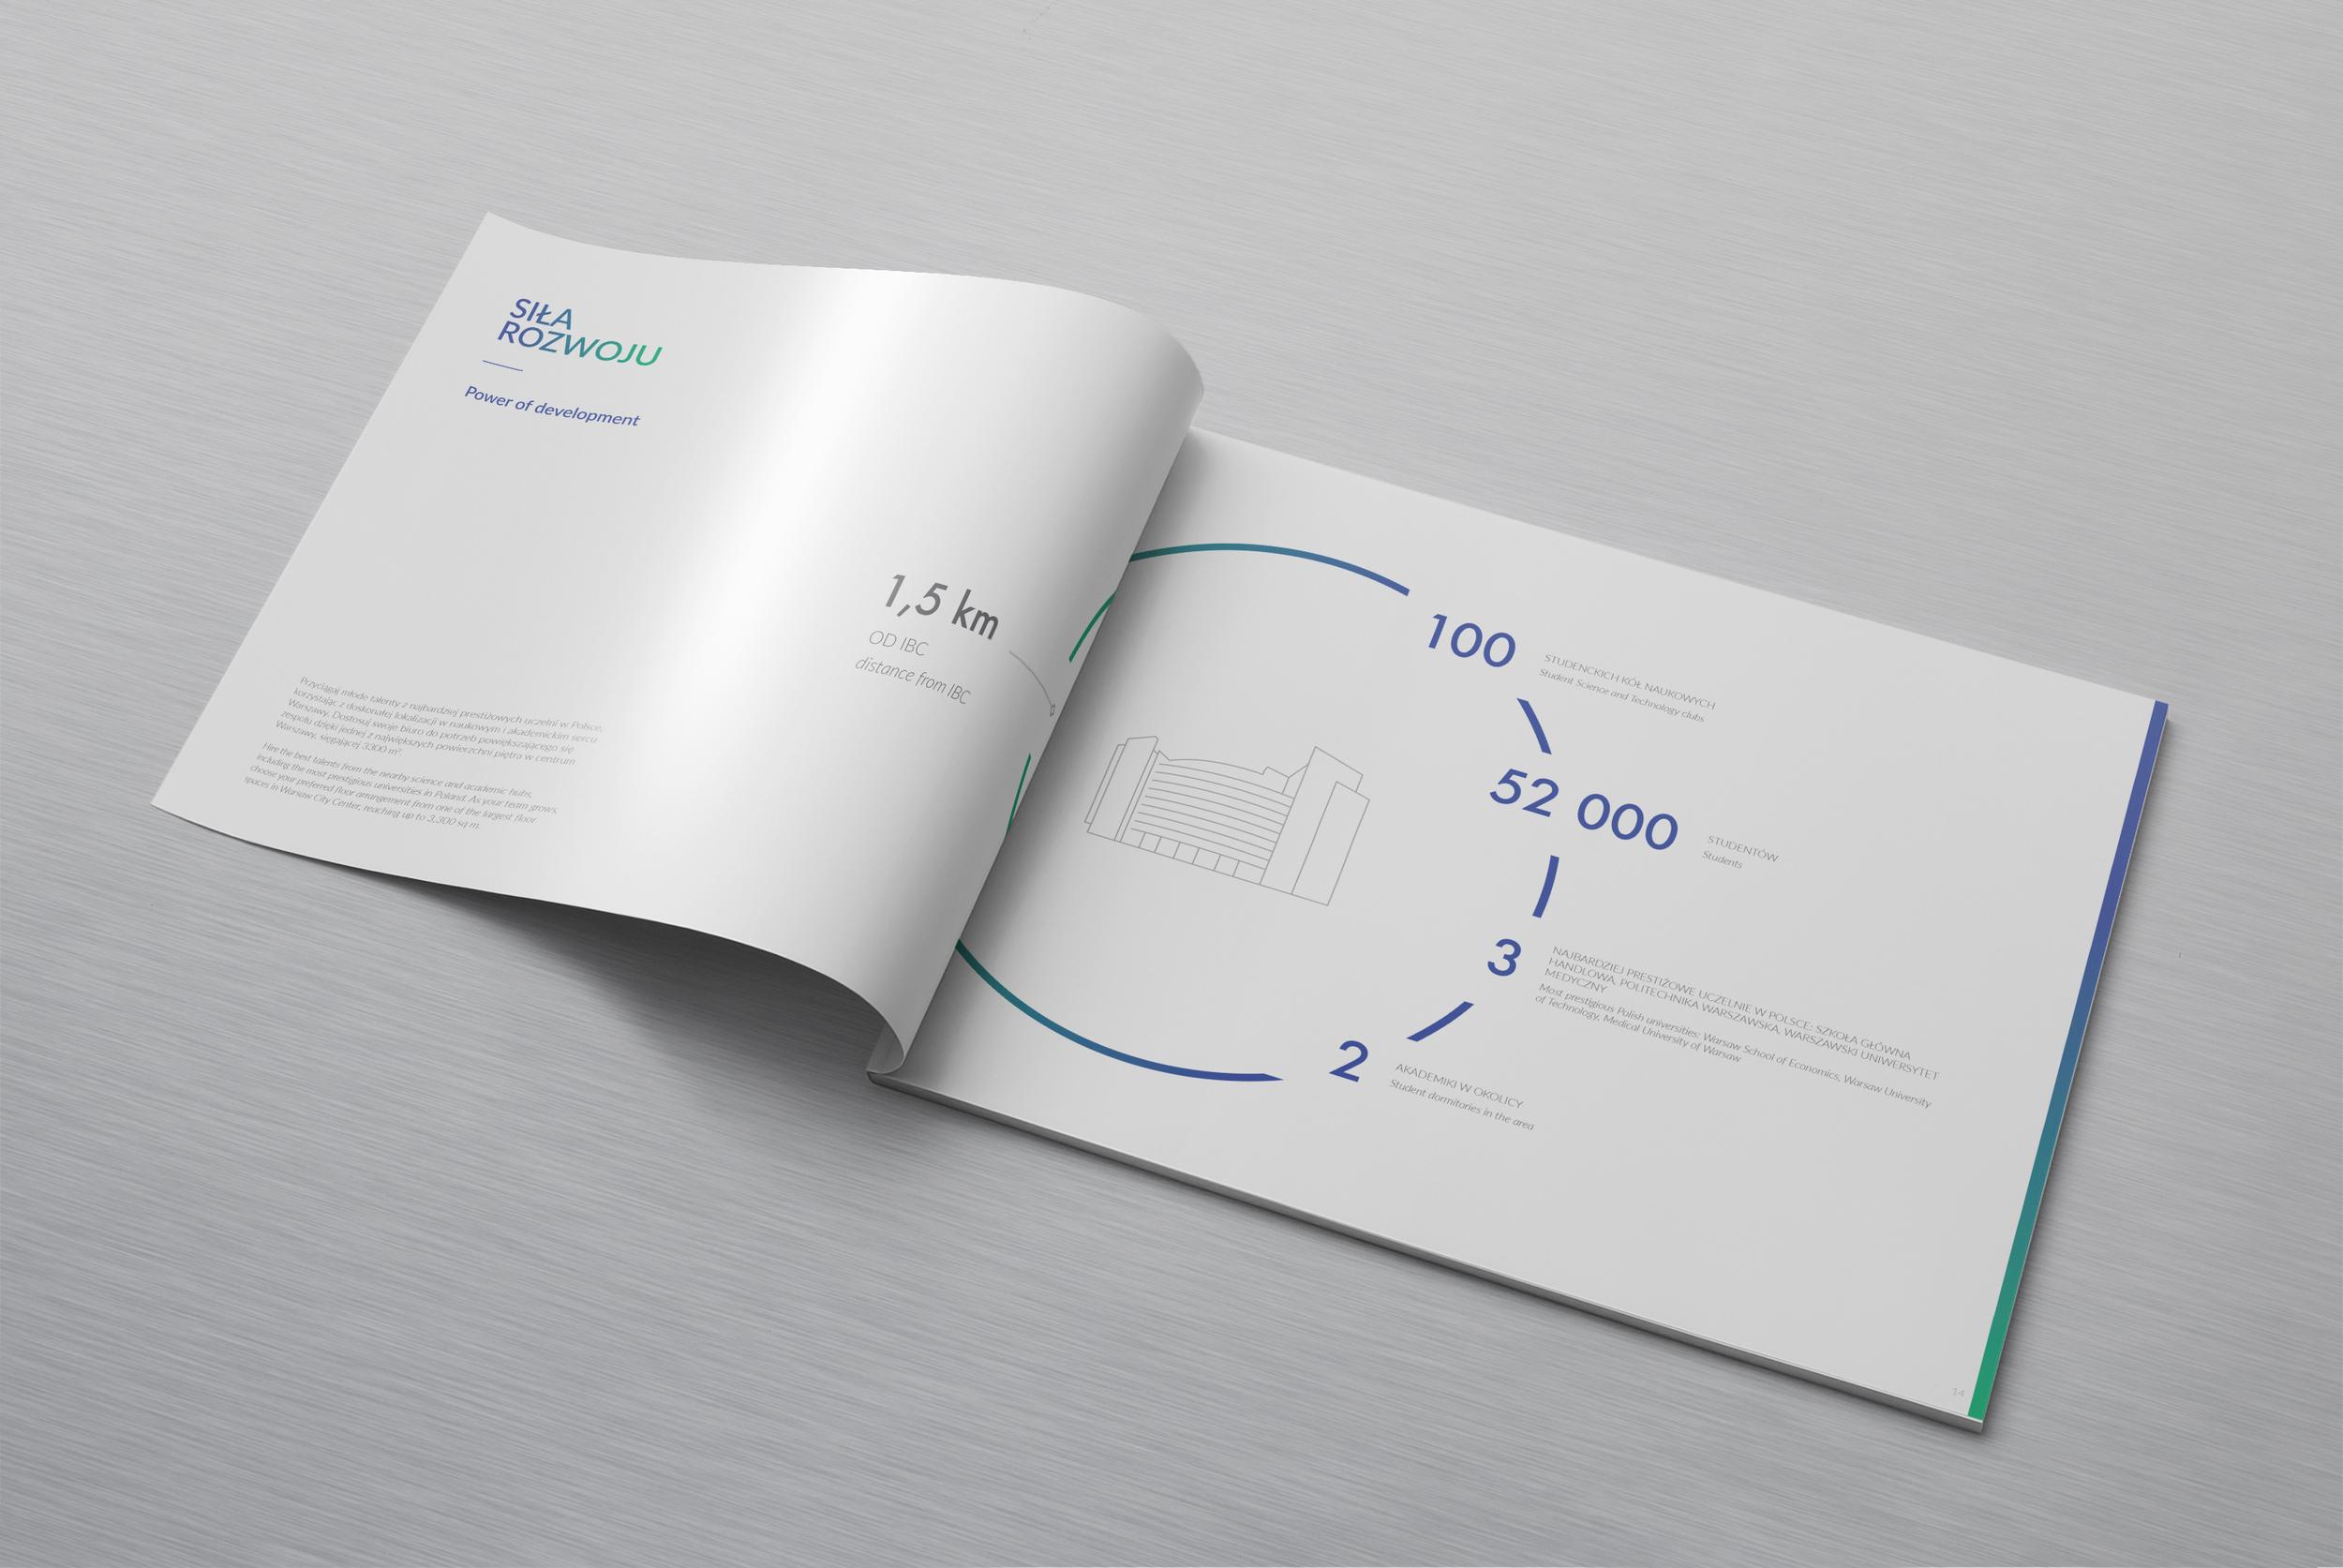 2015 Deka IBC brochure 6.jpg